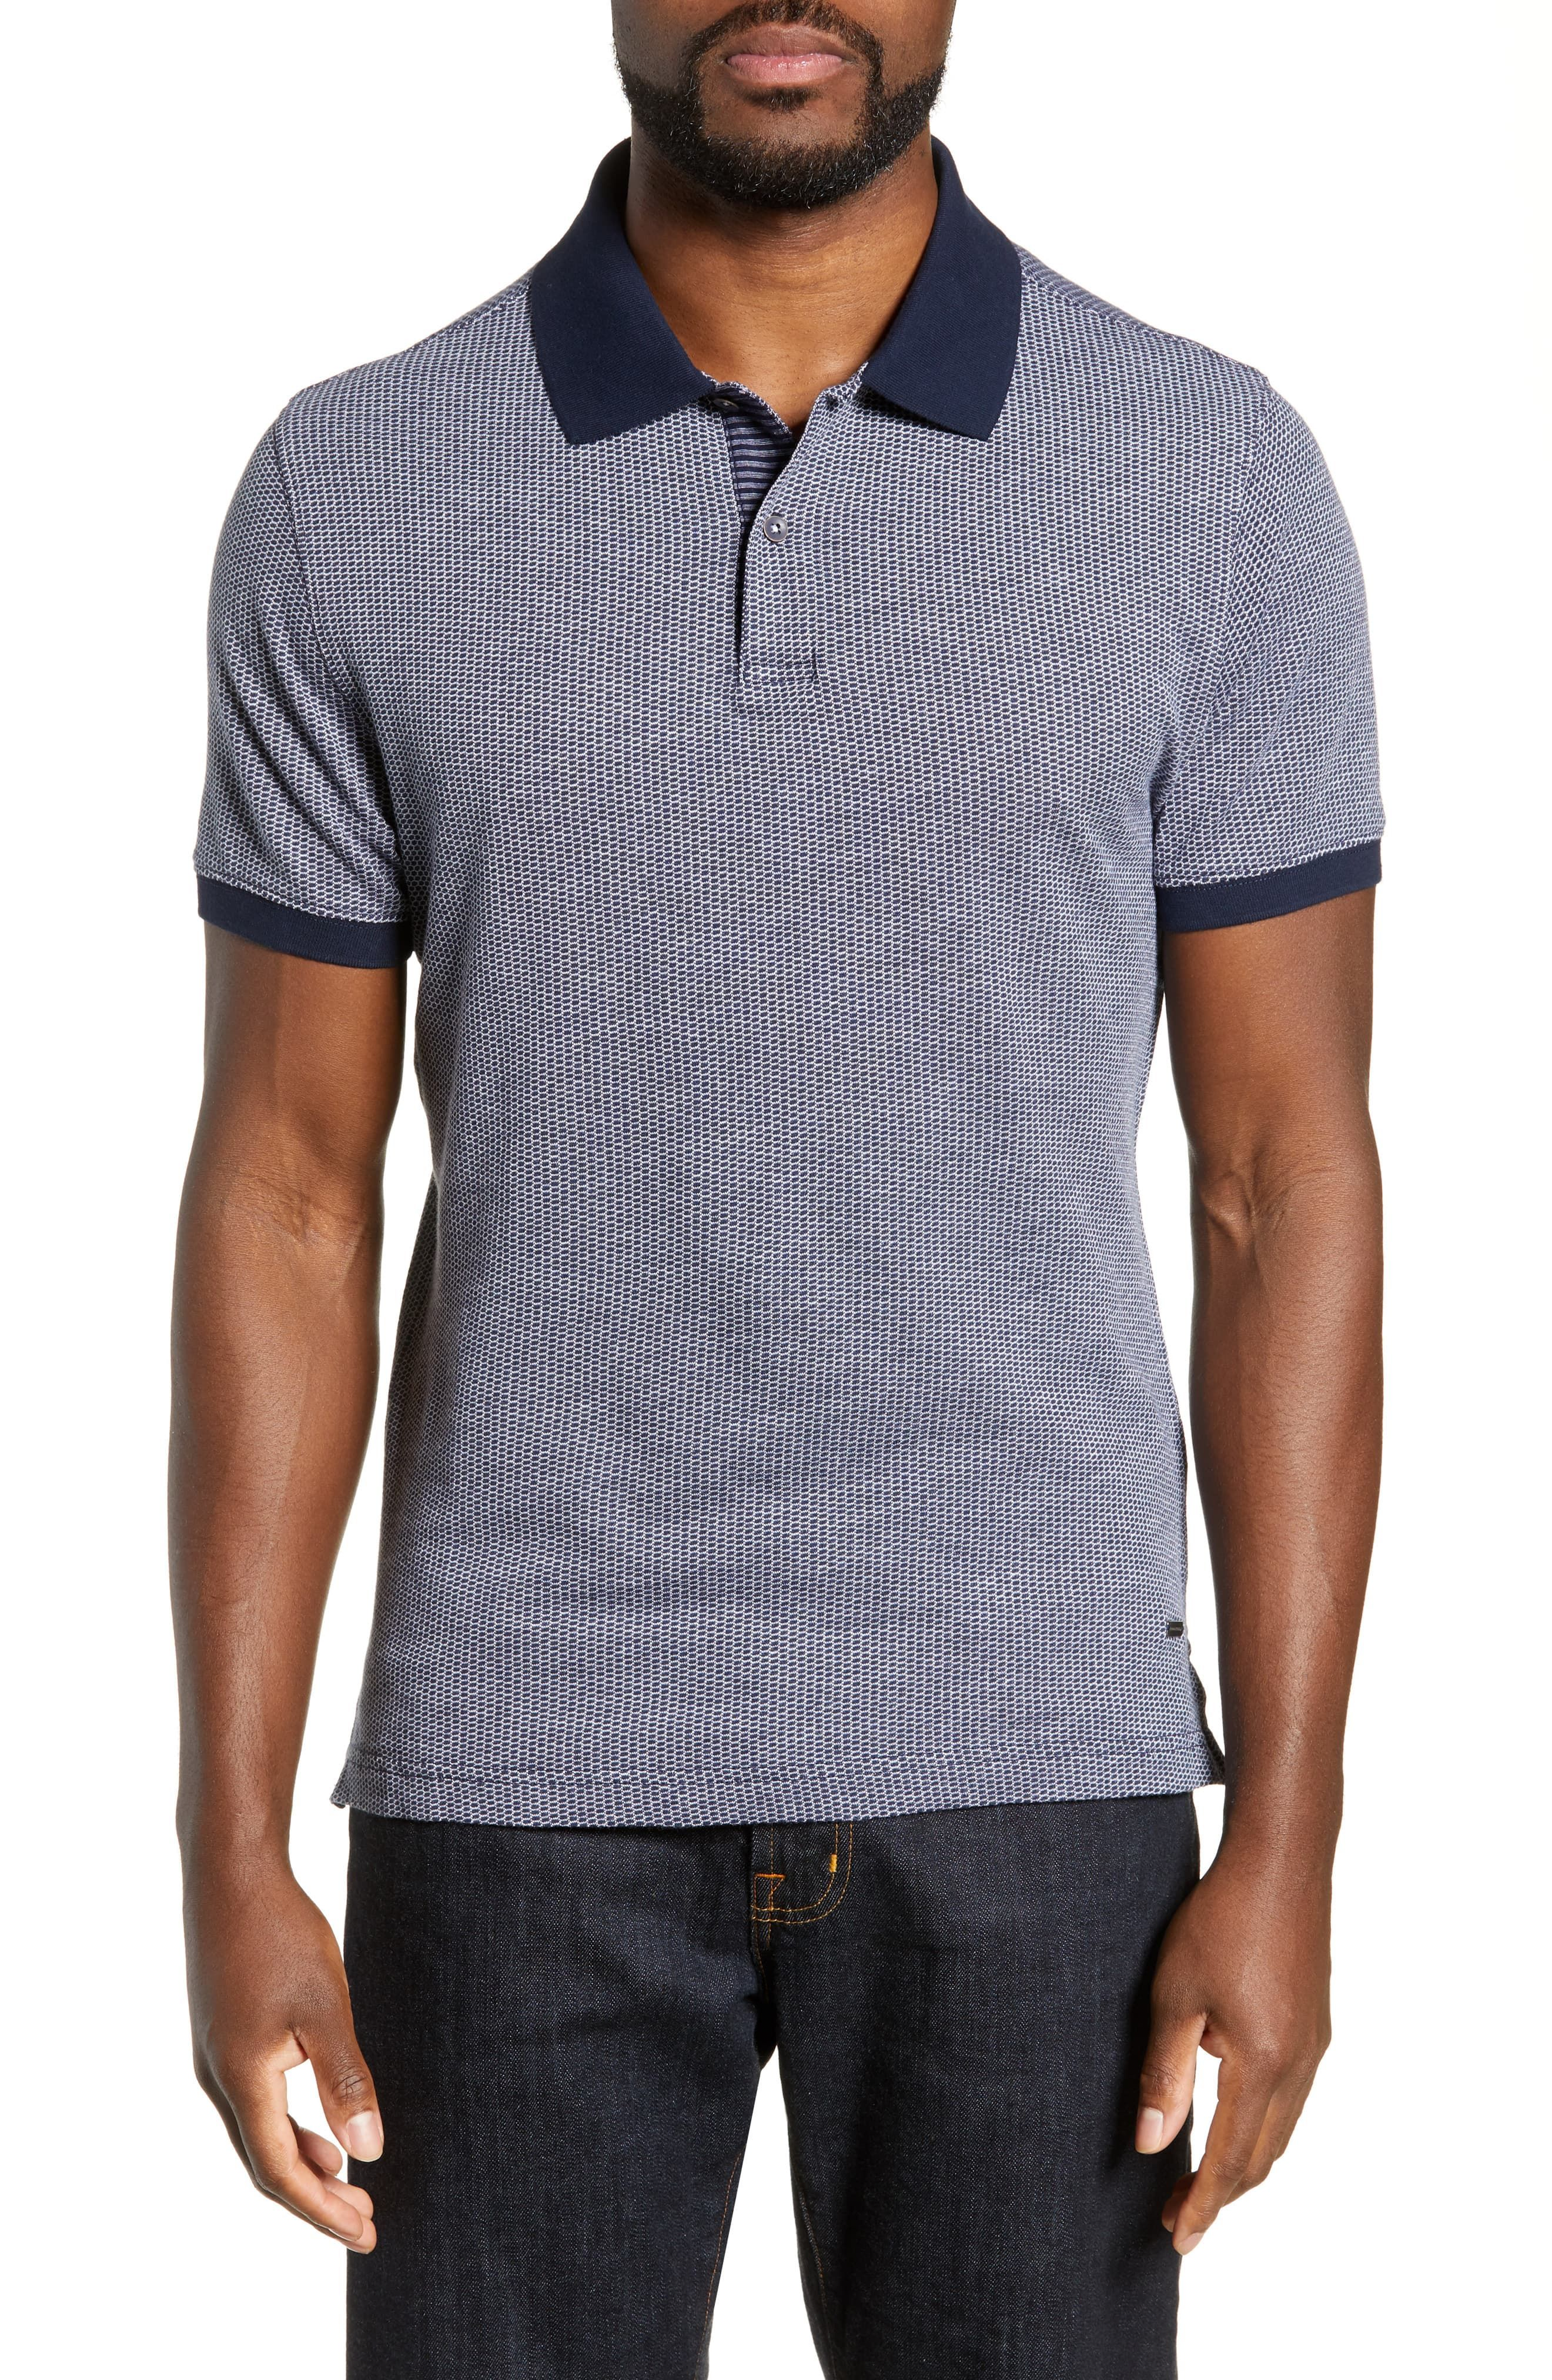 INC International Concepts Mens Chambray Shirt White Pure, Small